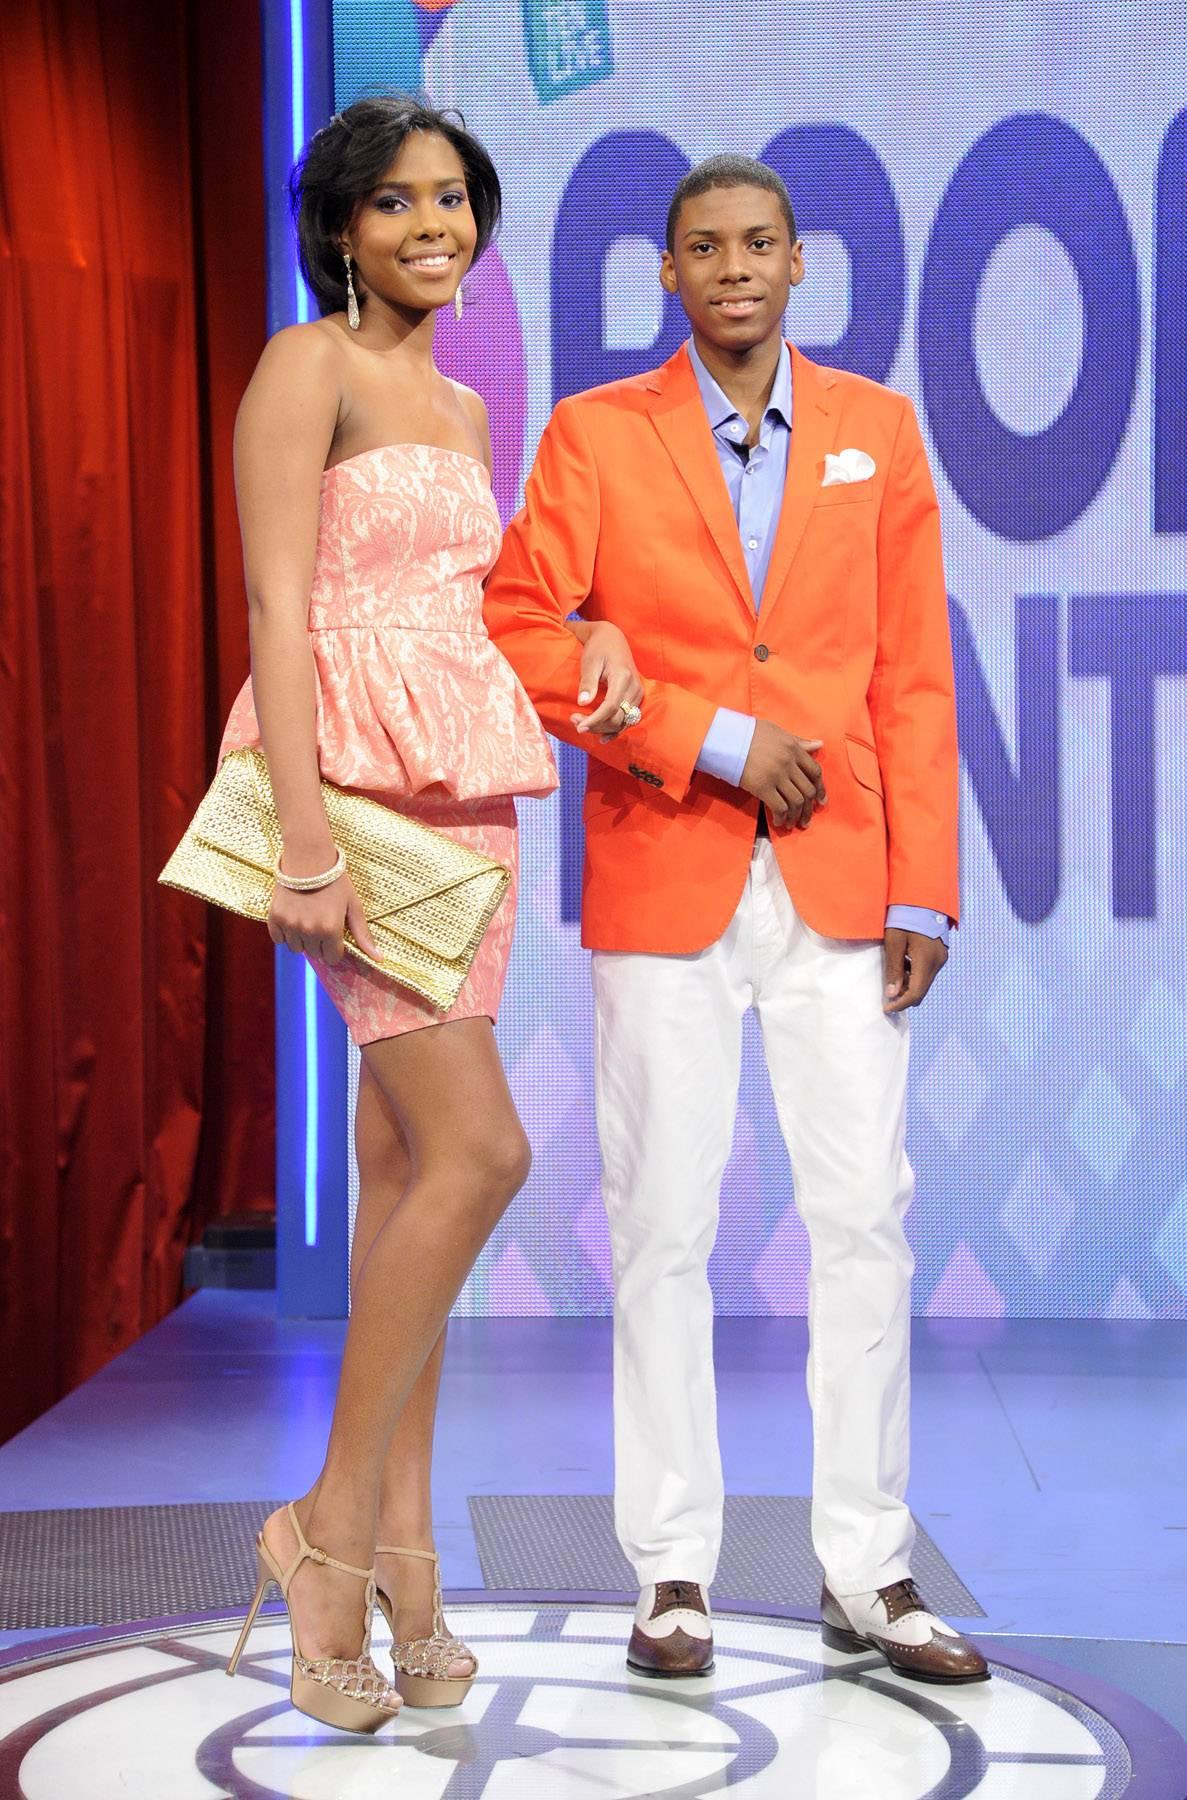 Boy and girl - Prom Night fashion show at 106 & Park, May 16, 2012. (Photo: John Ricard / BET)